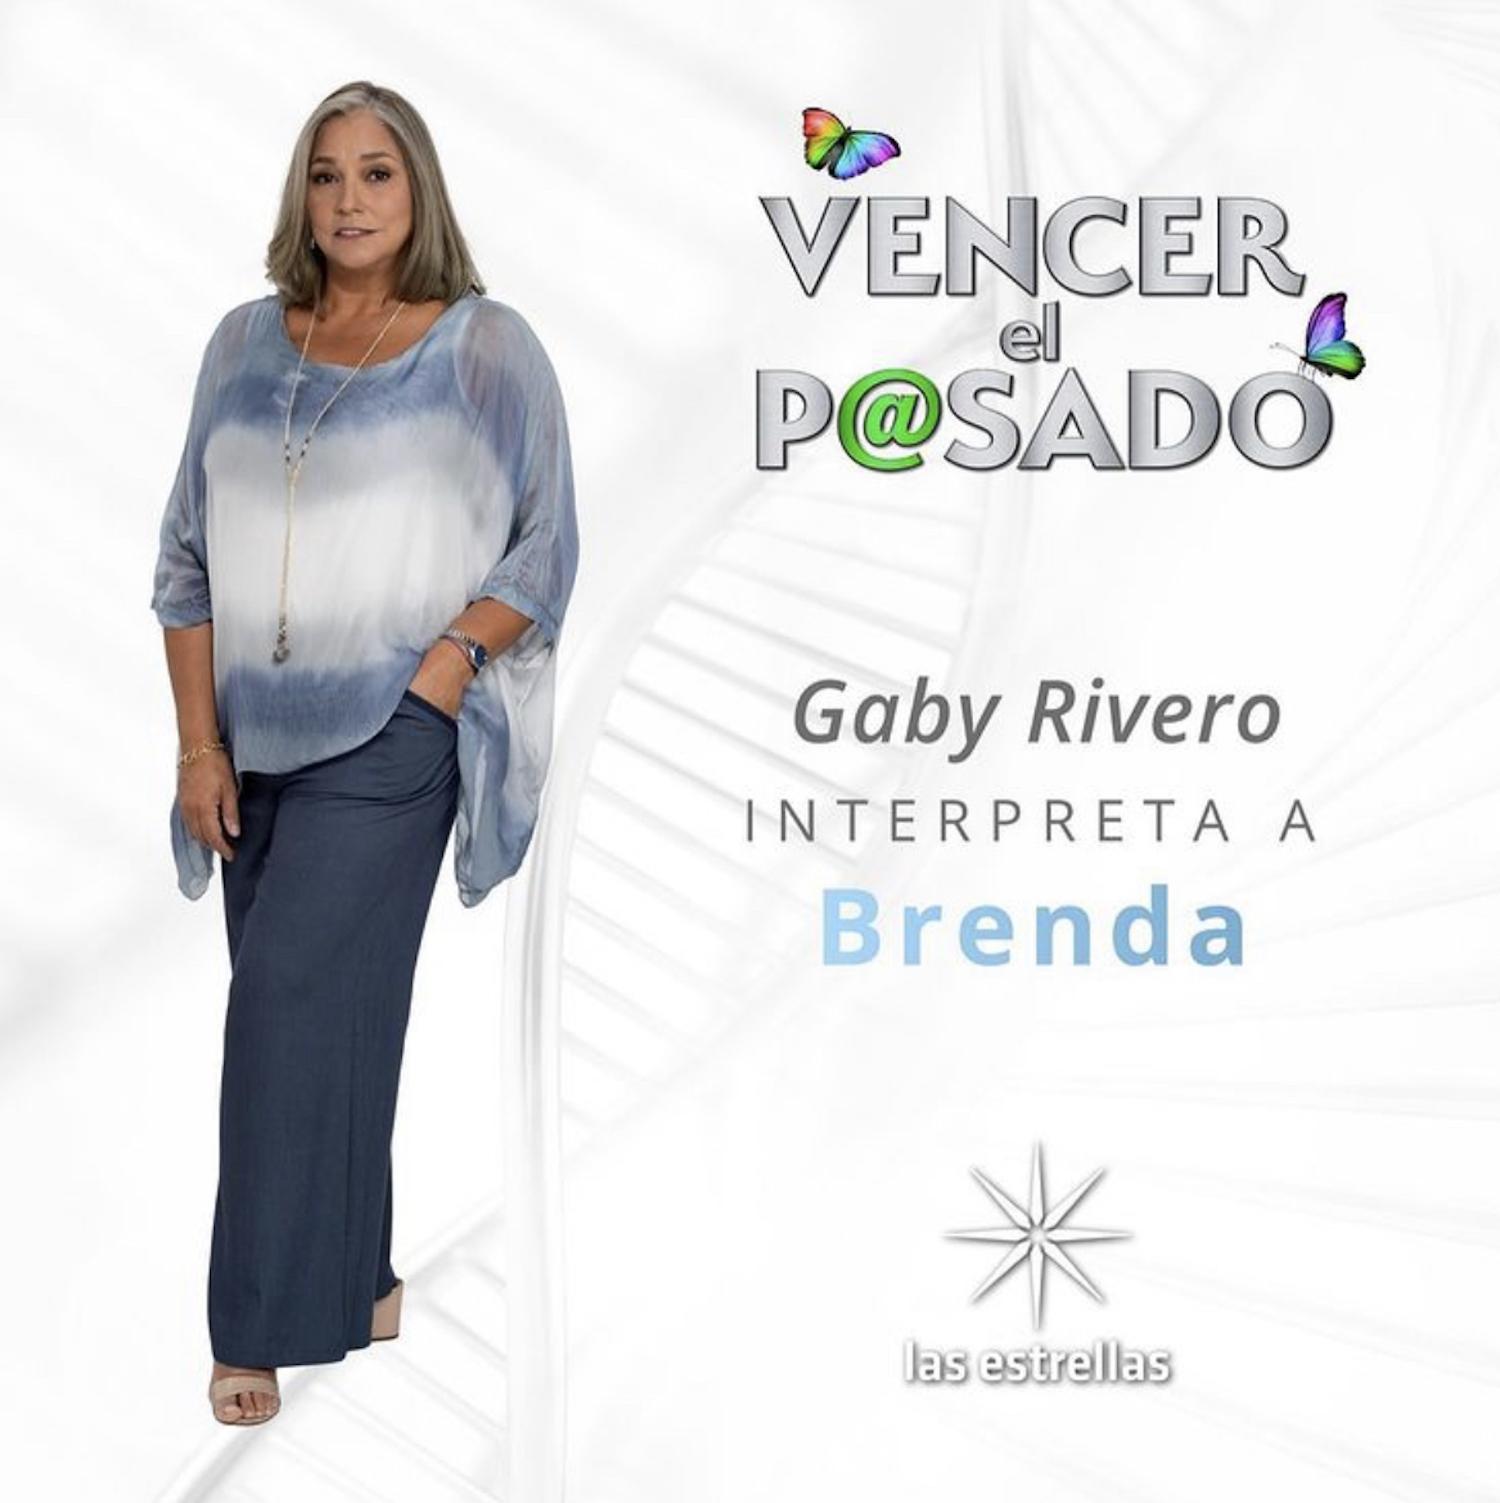 Gaby Rivero